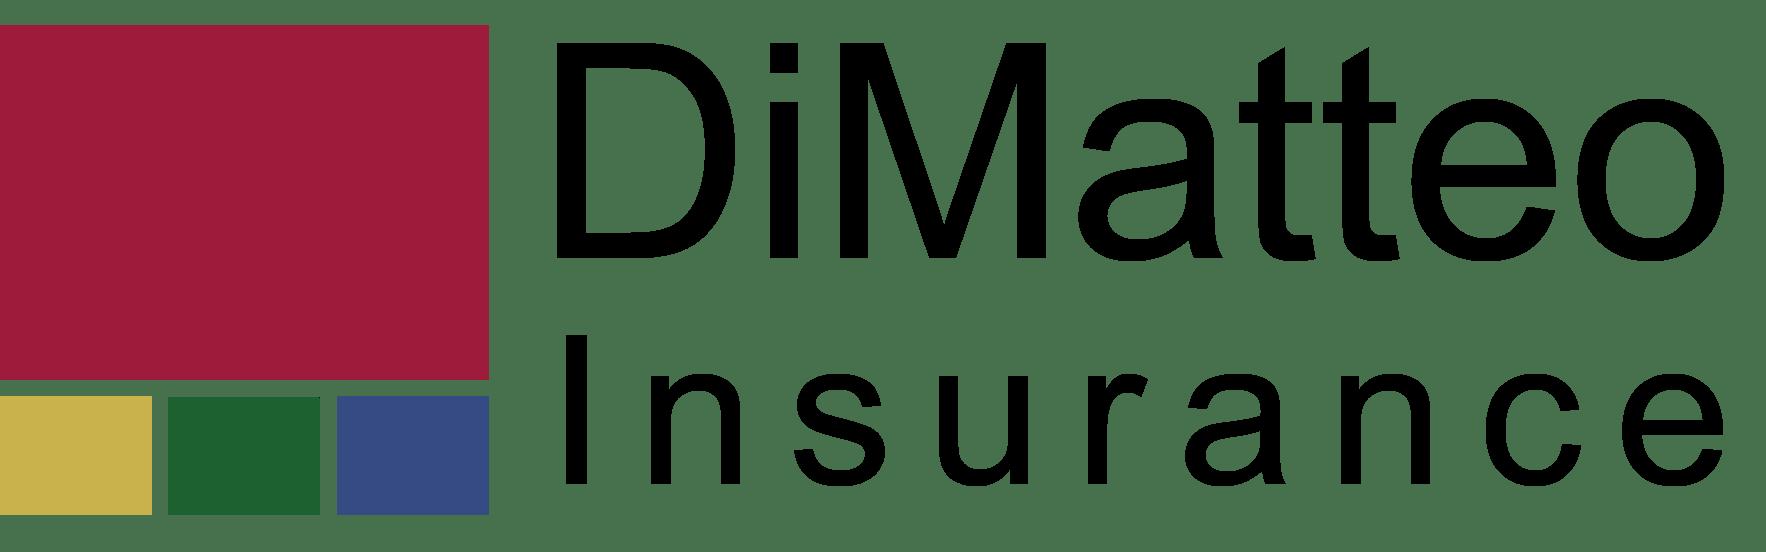 DiMatteo Insurance